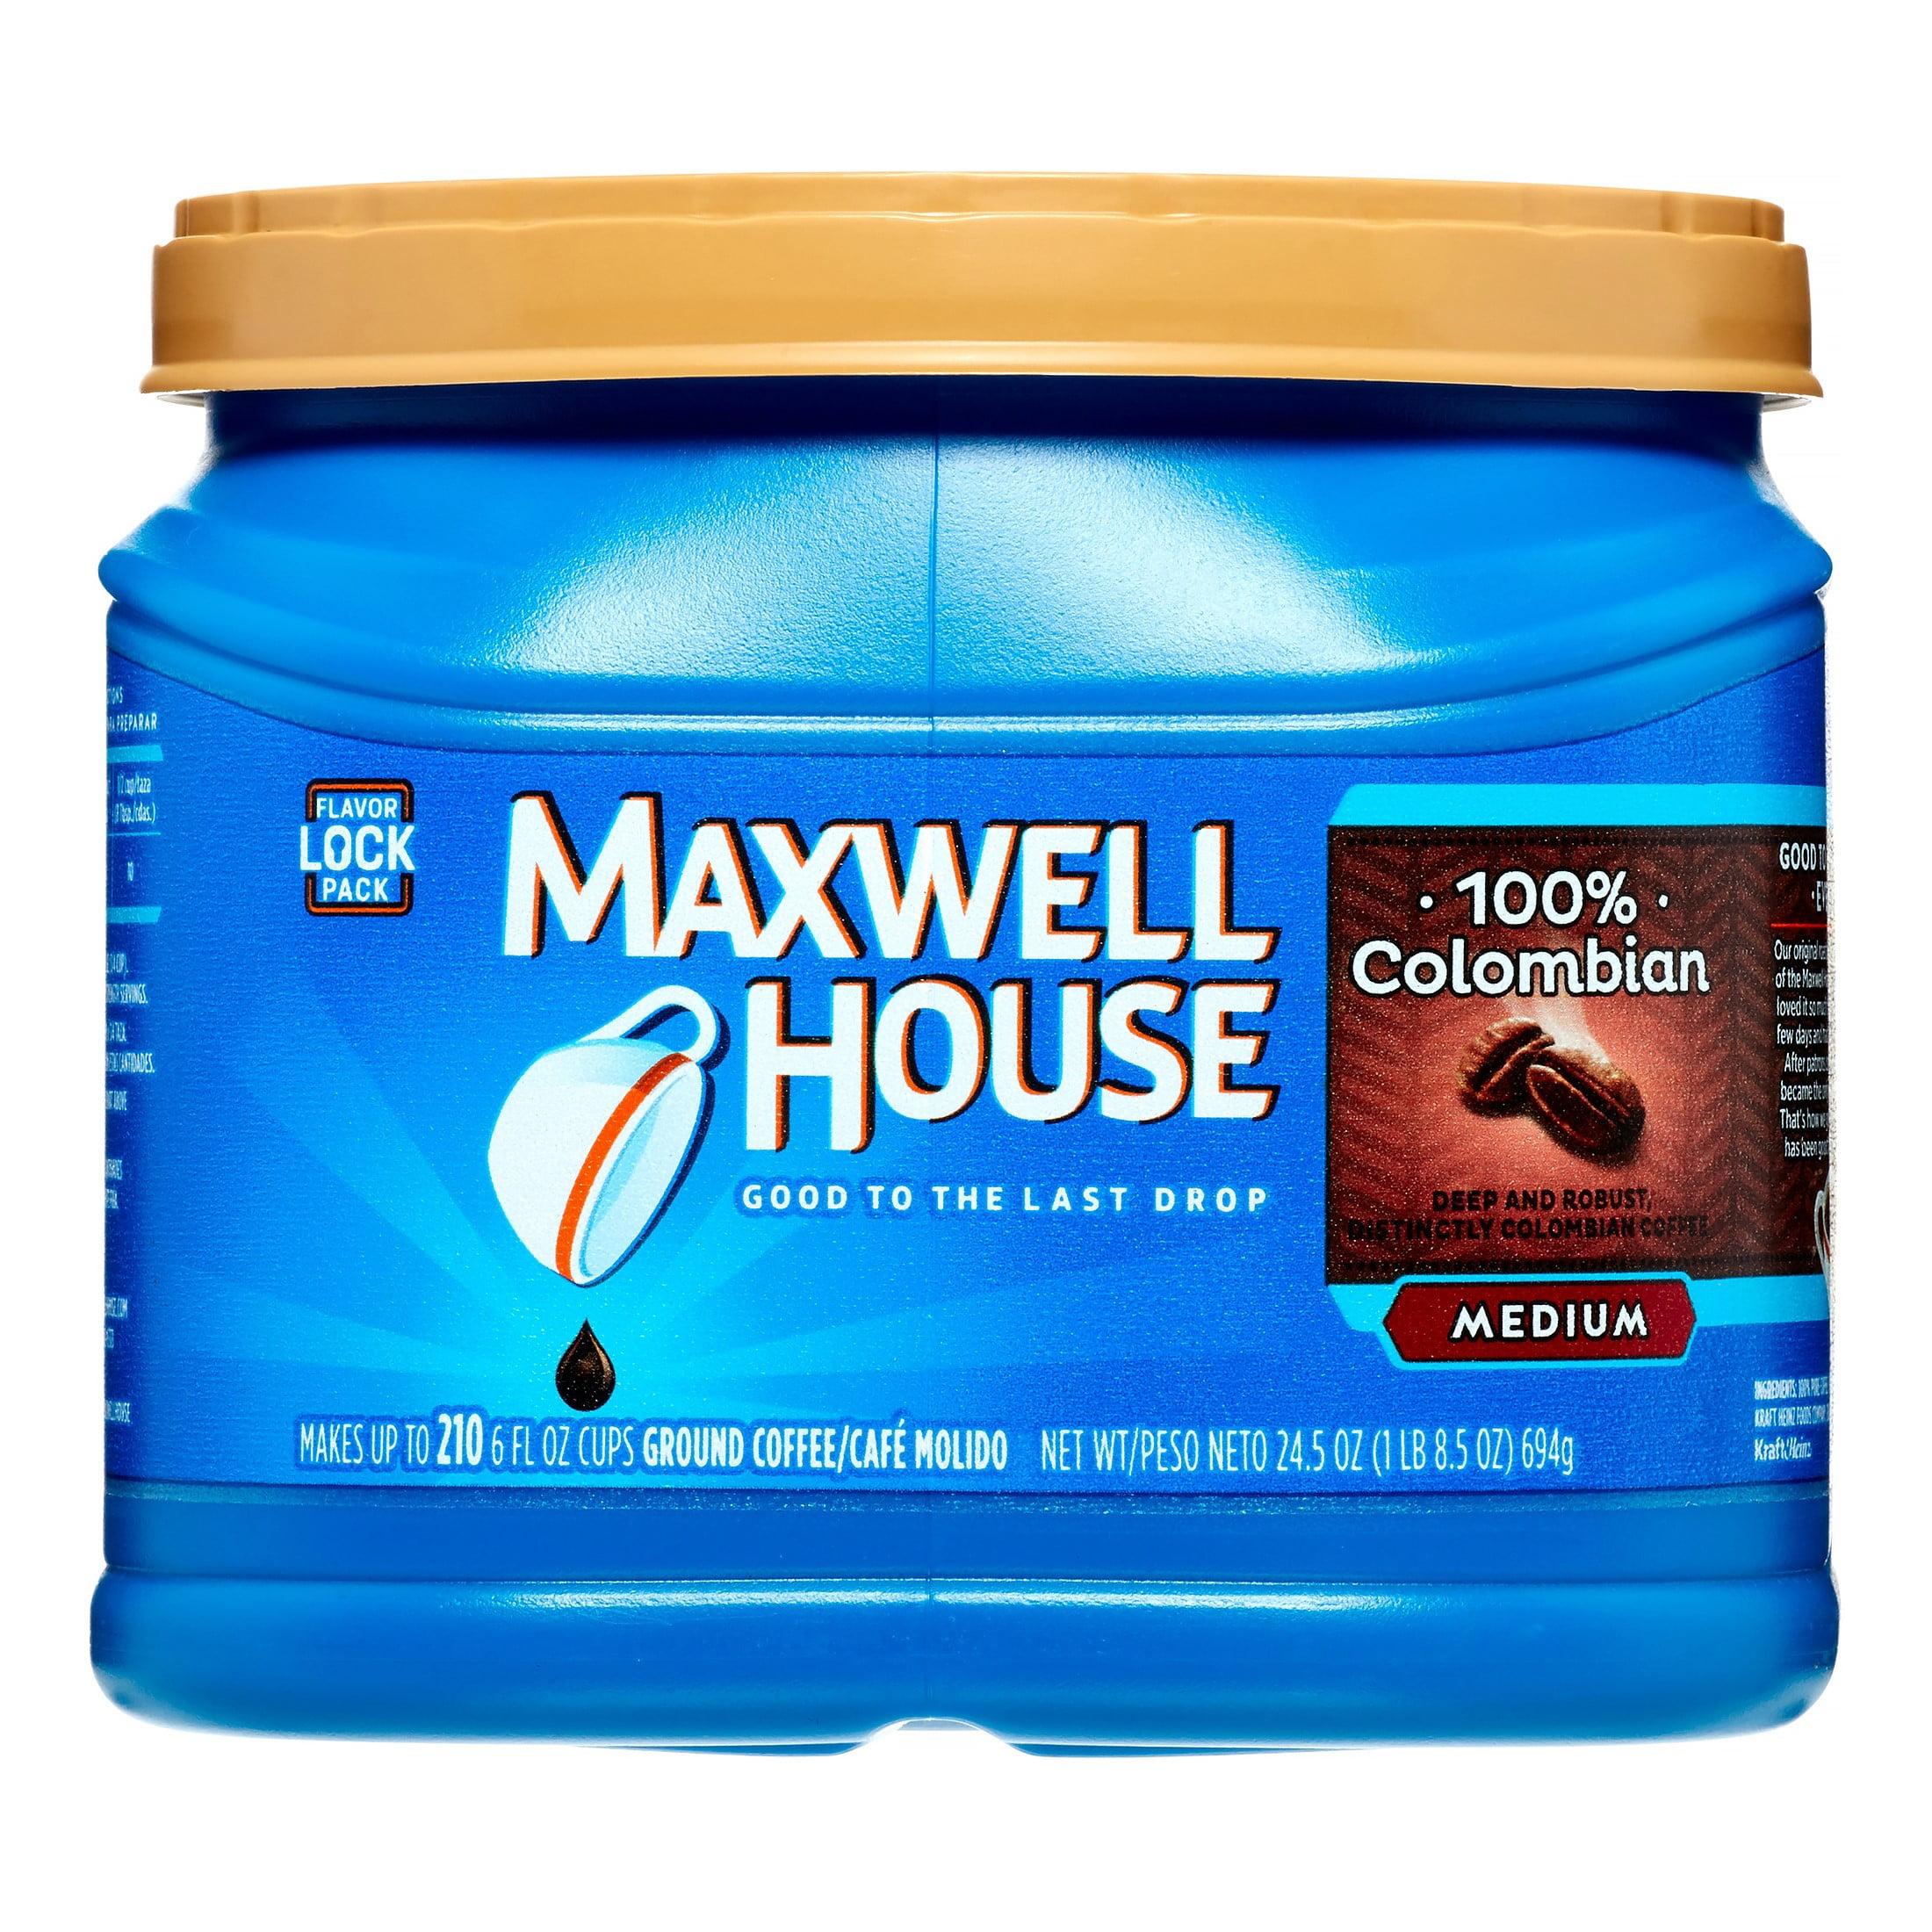 Maxwell House 100% Colombian Ground Coffee 24.5 oz. Tub